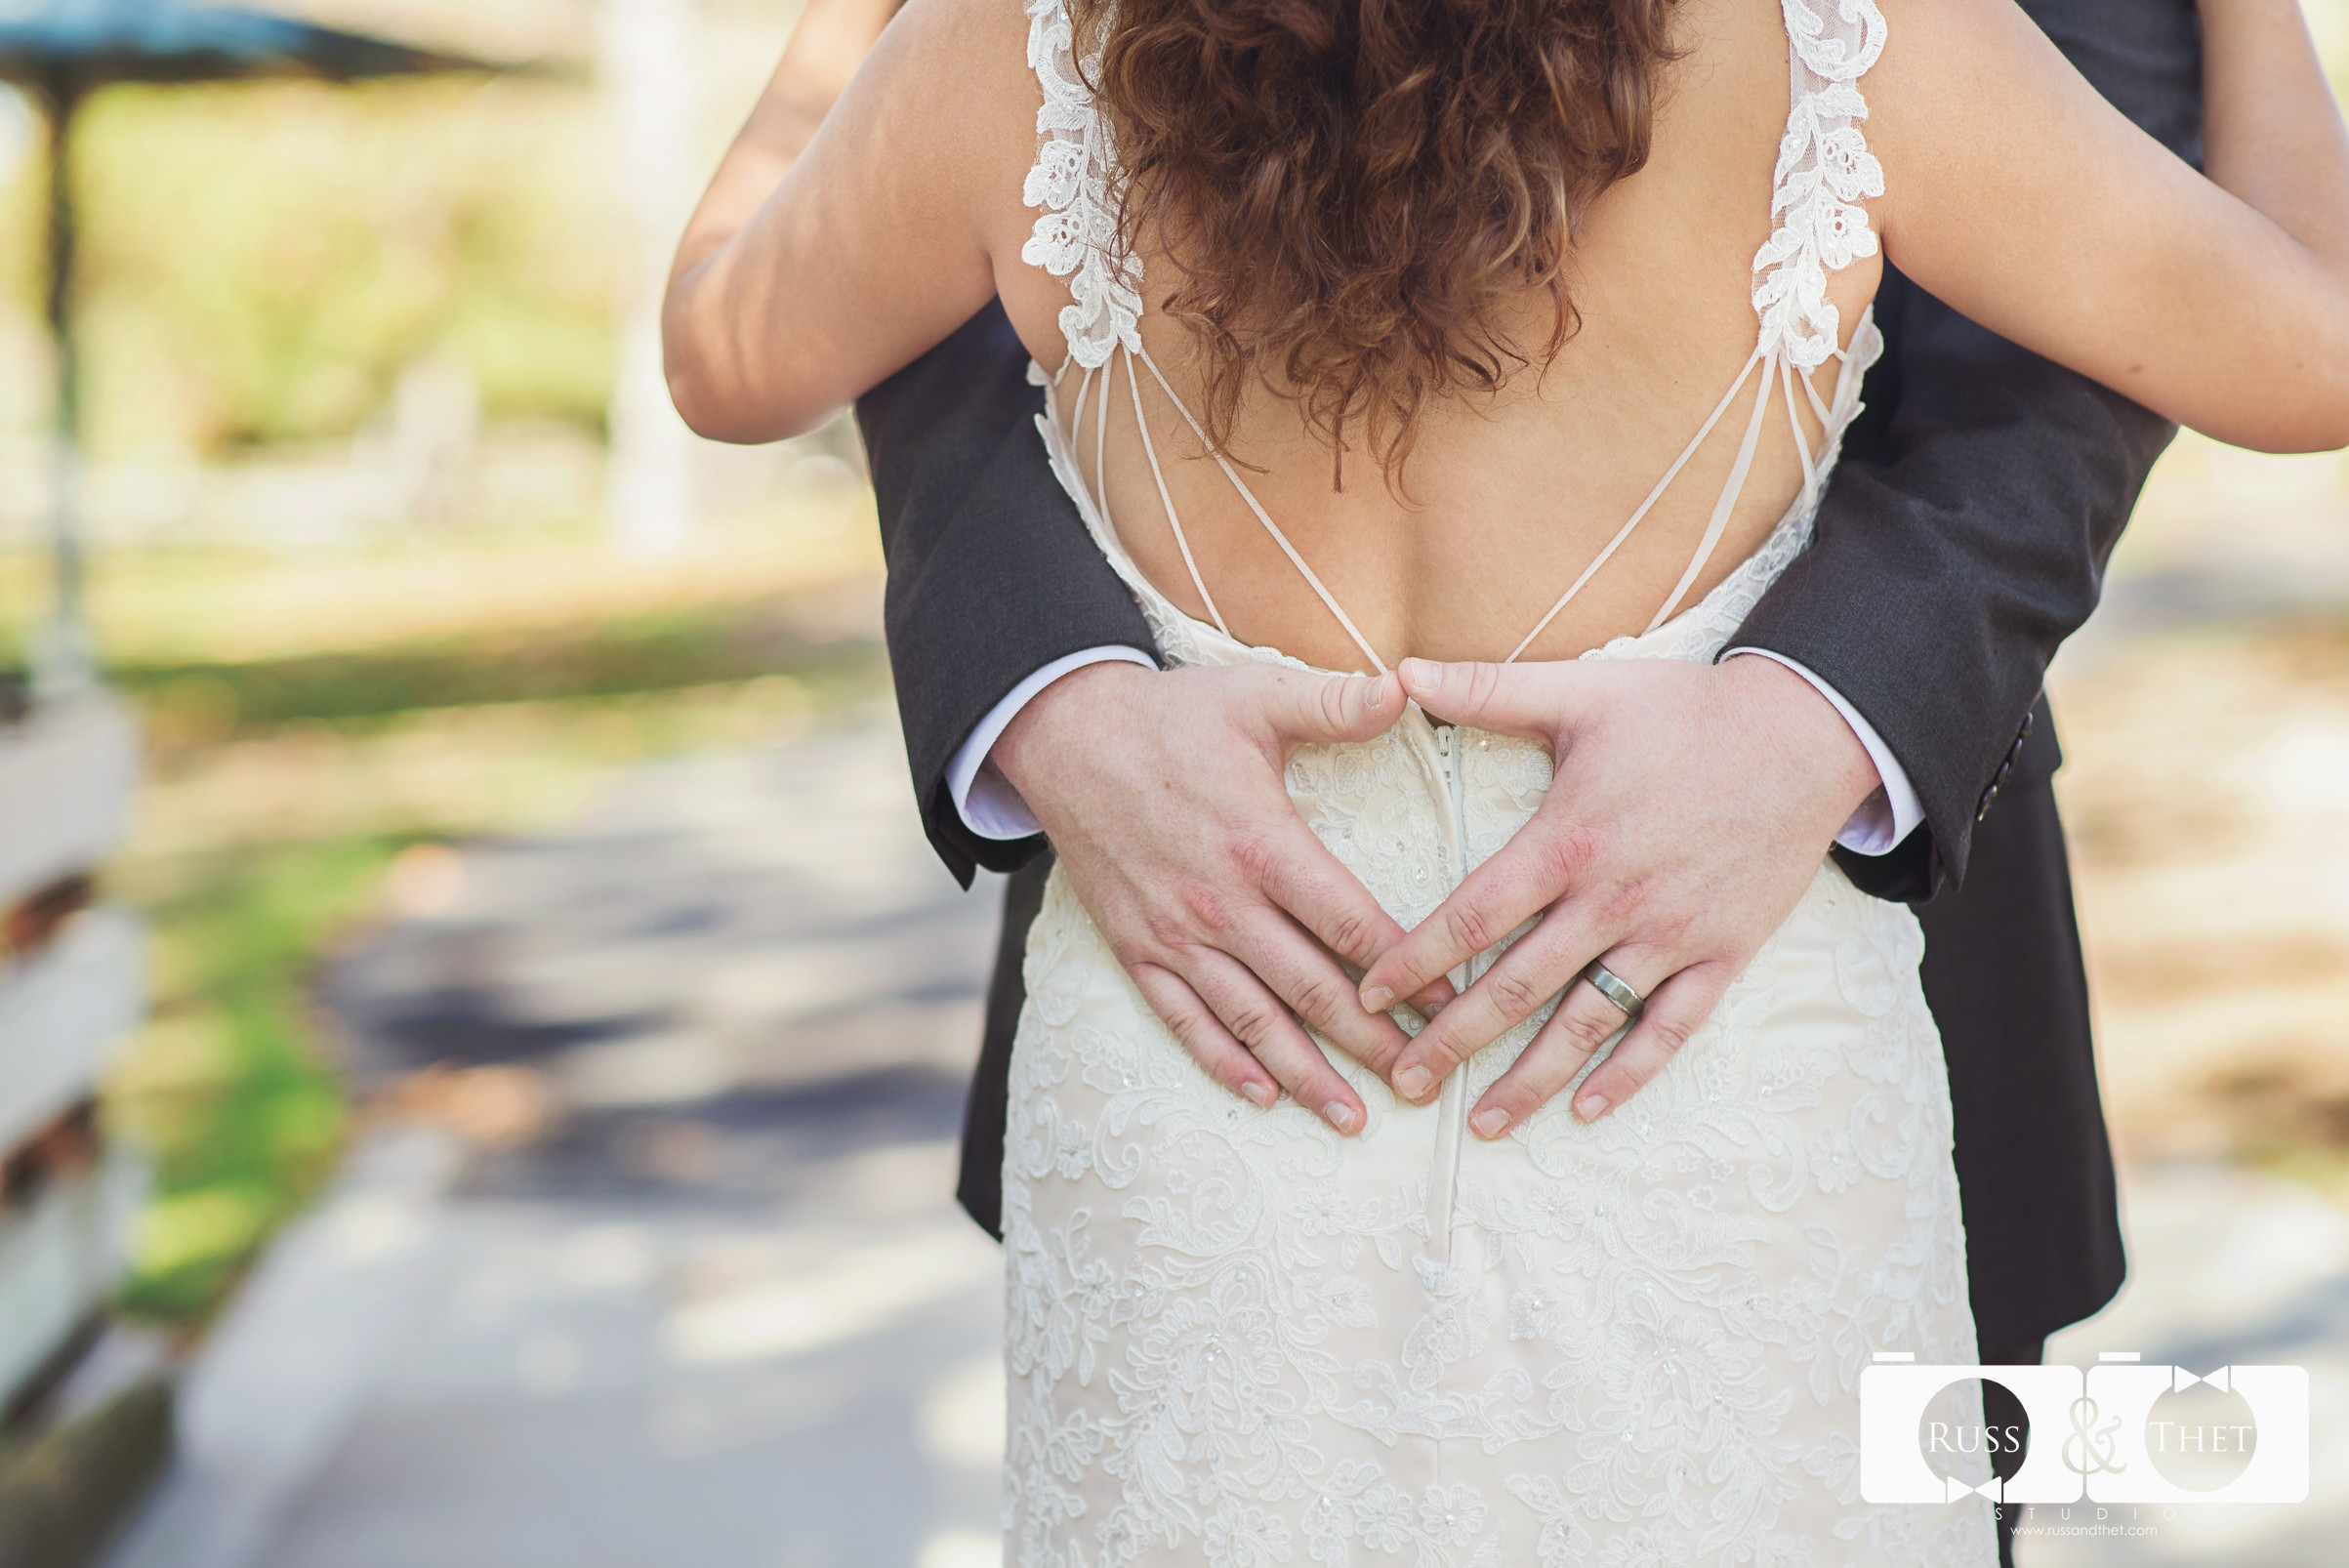 Andrew-and-Cristina-Yorba-Park-Wedding-Photographers (4).jpg